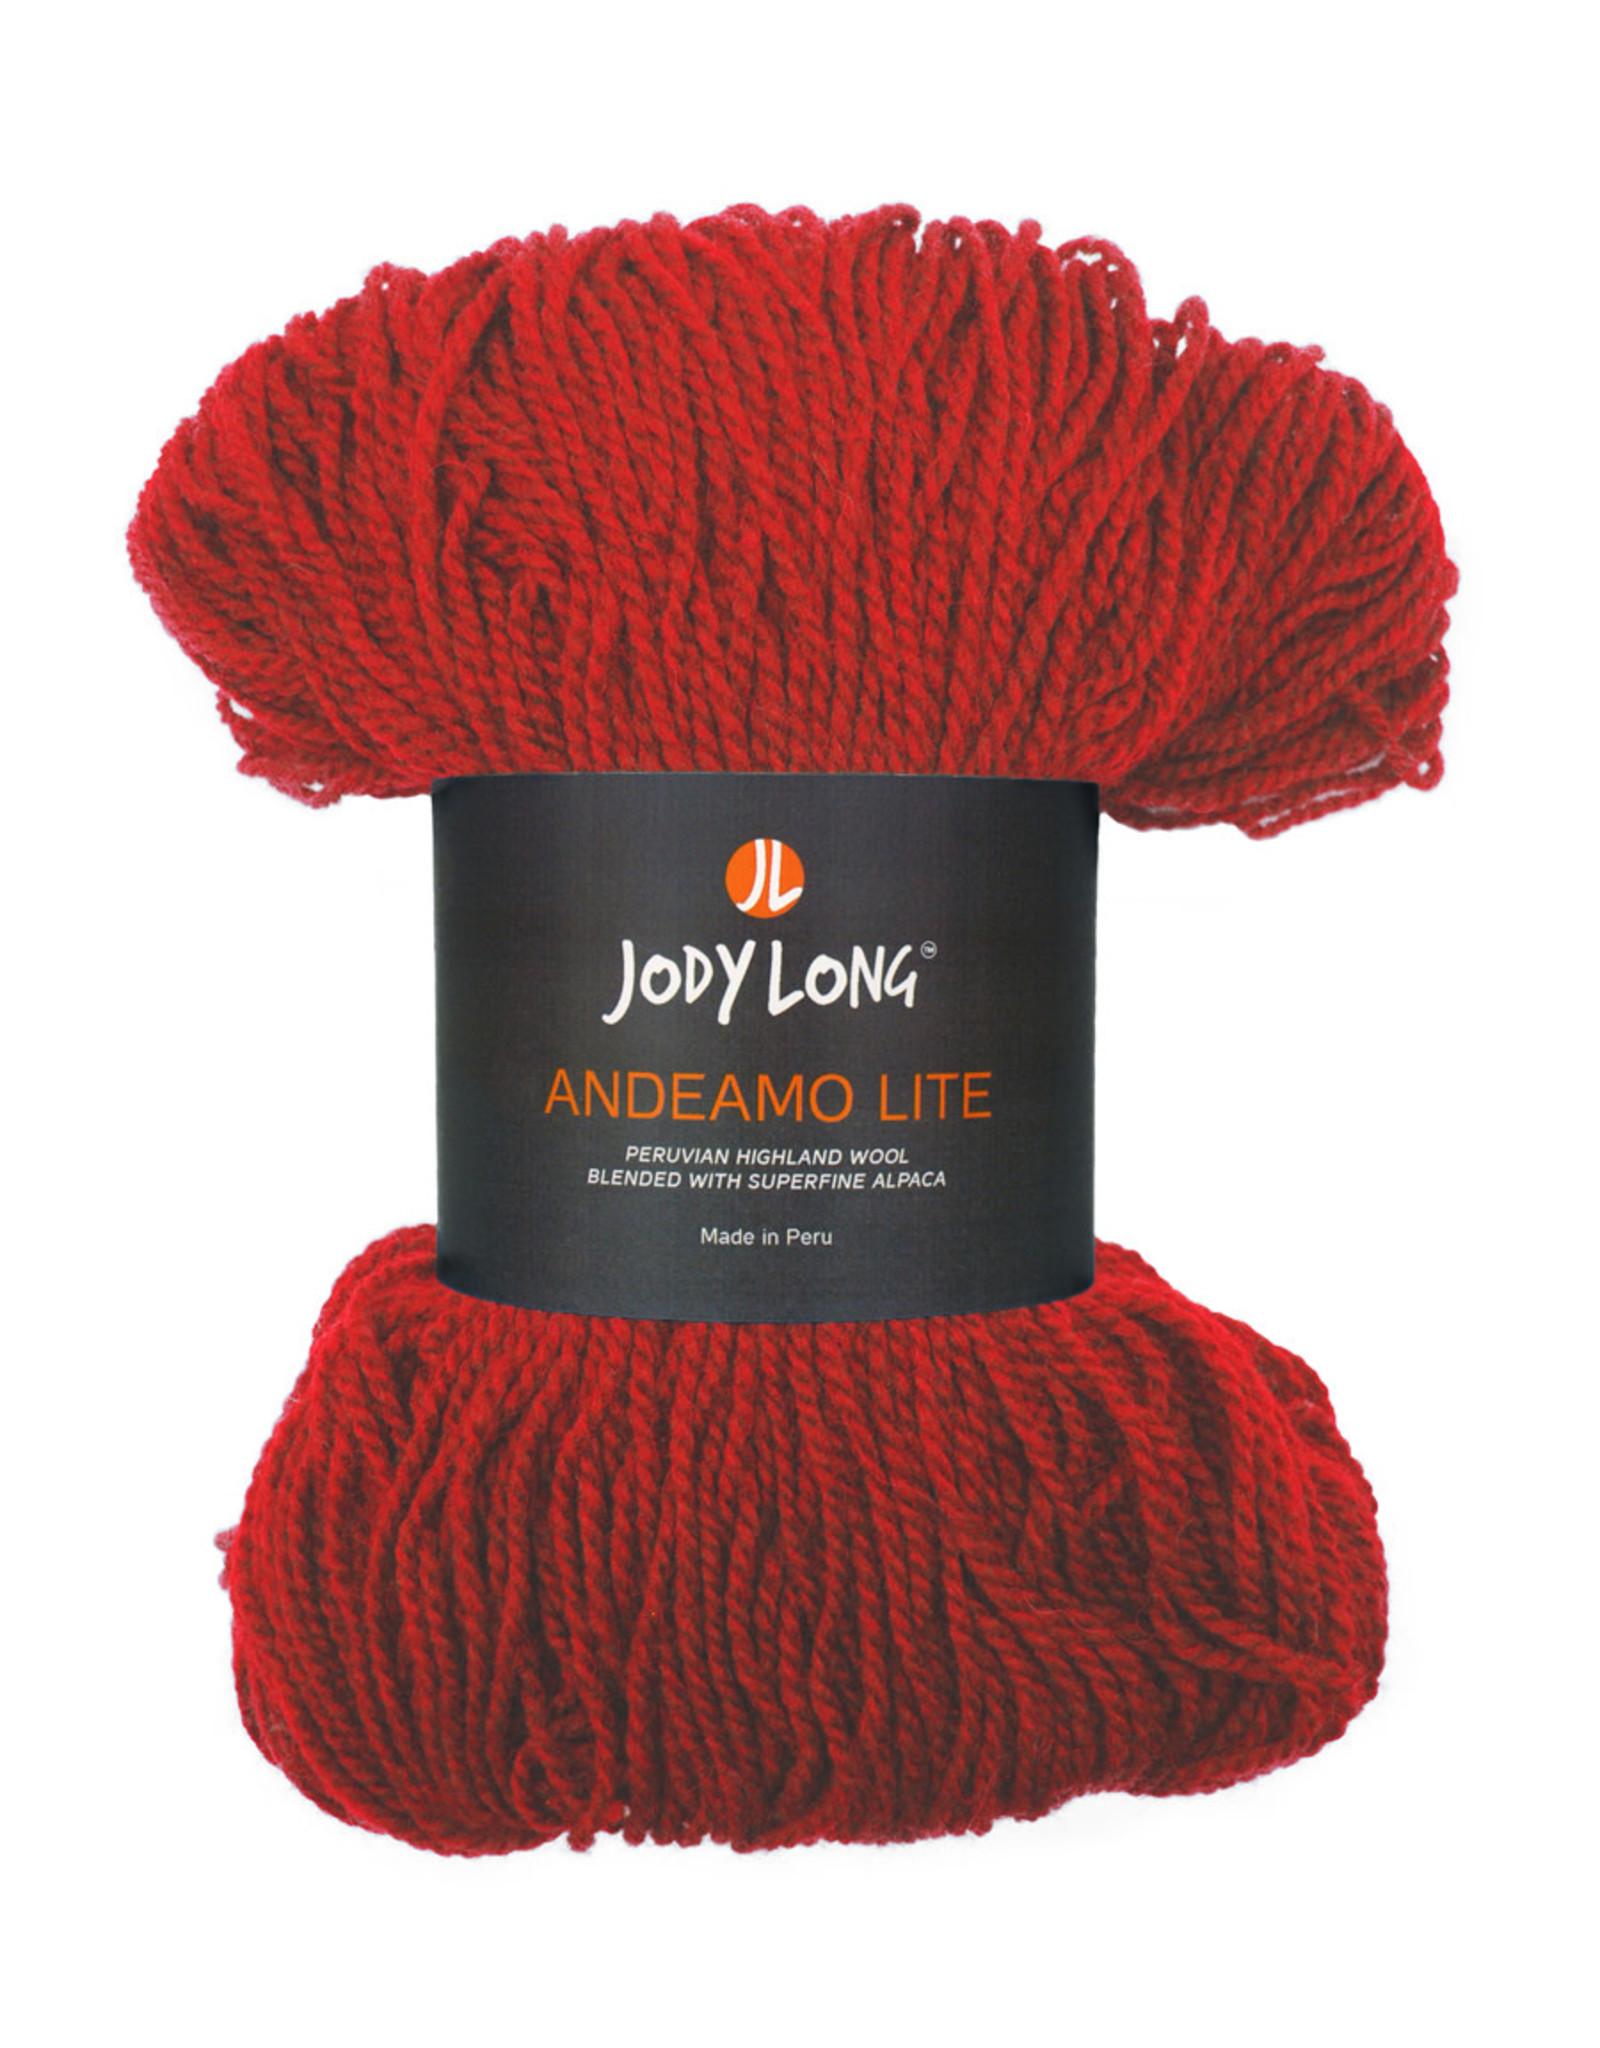 Jody Long Andeamo Lite #008 Lipstick